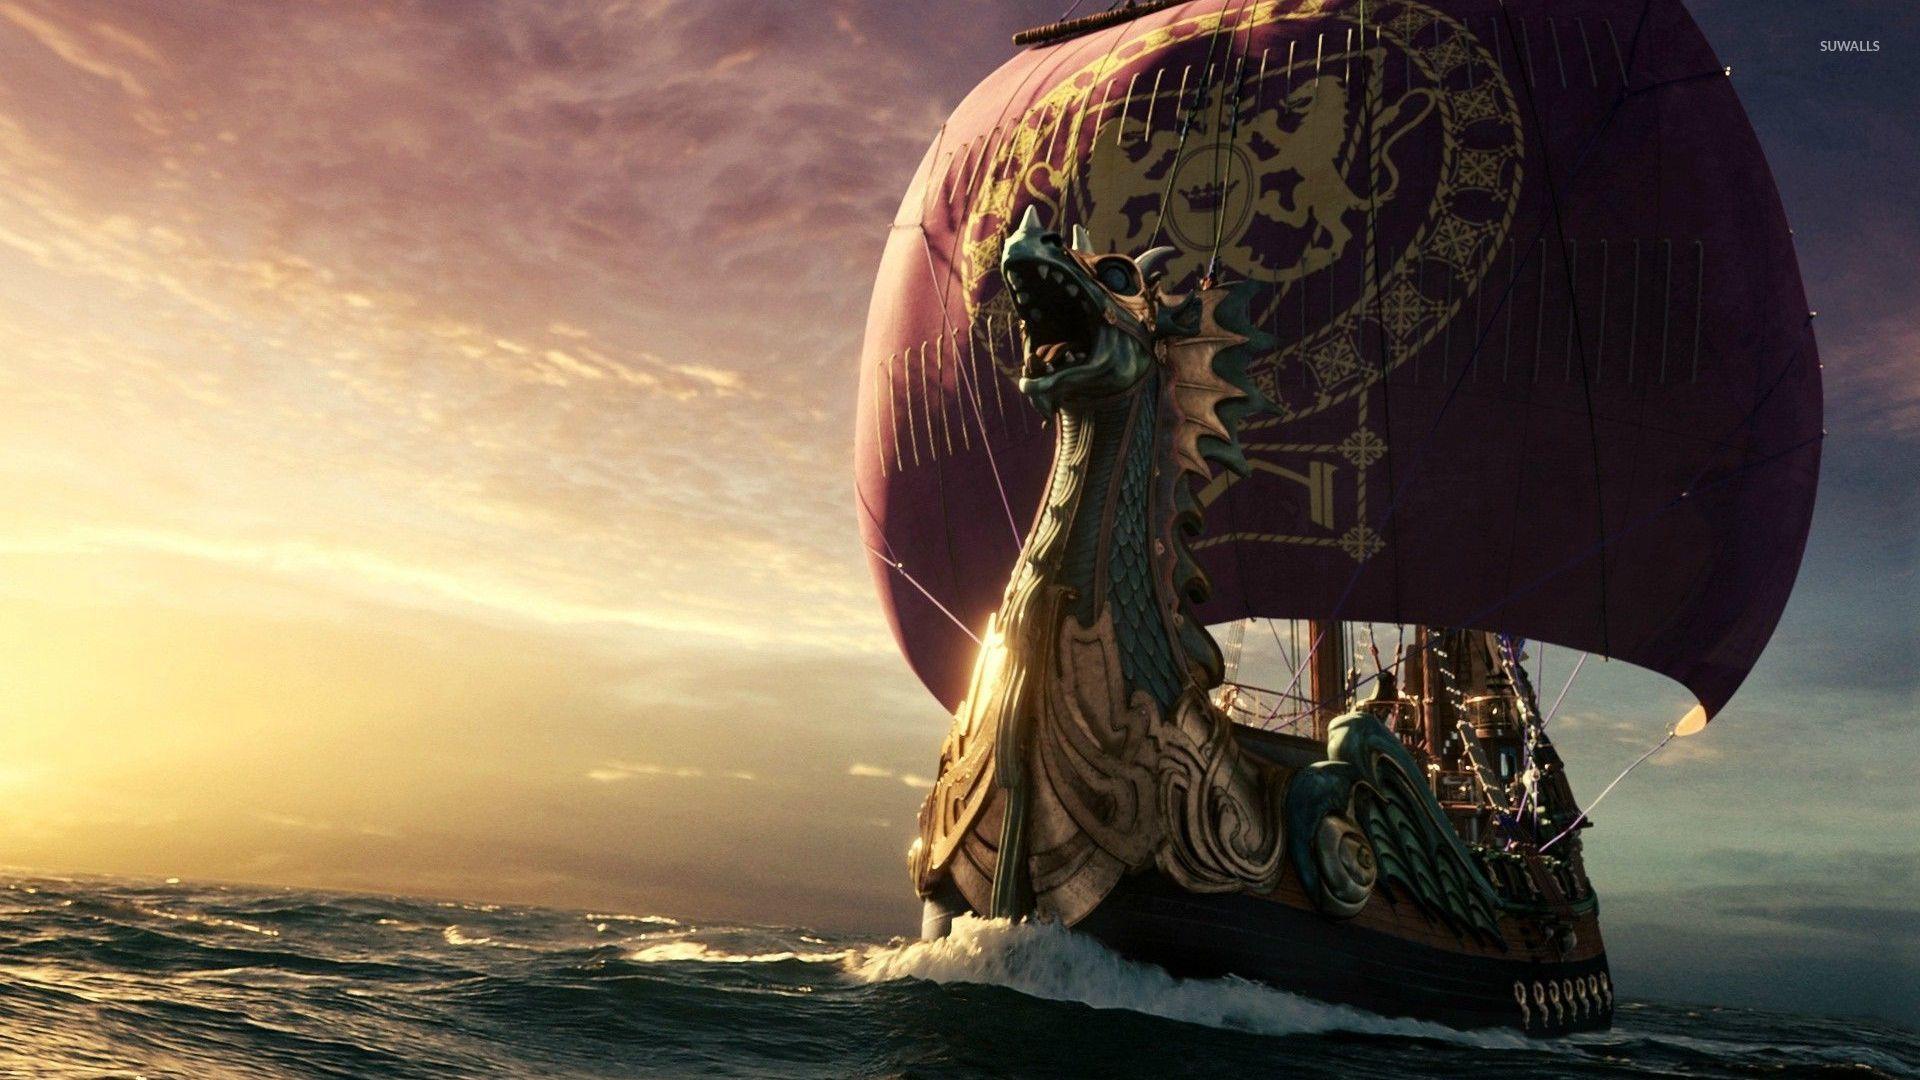 Dawn Treader Ship Wallpaper  Fantasy Wallpapers 29309